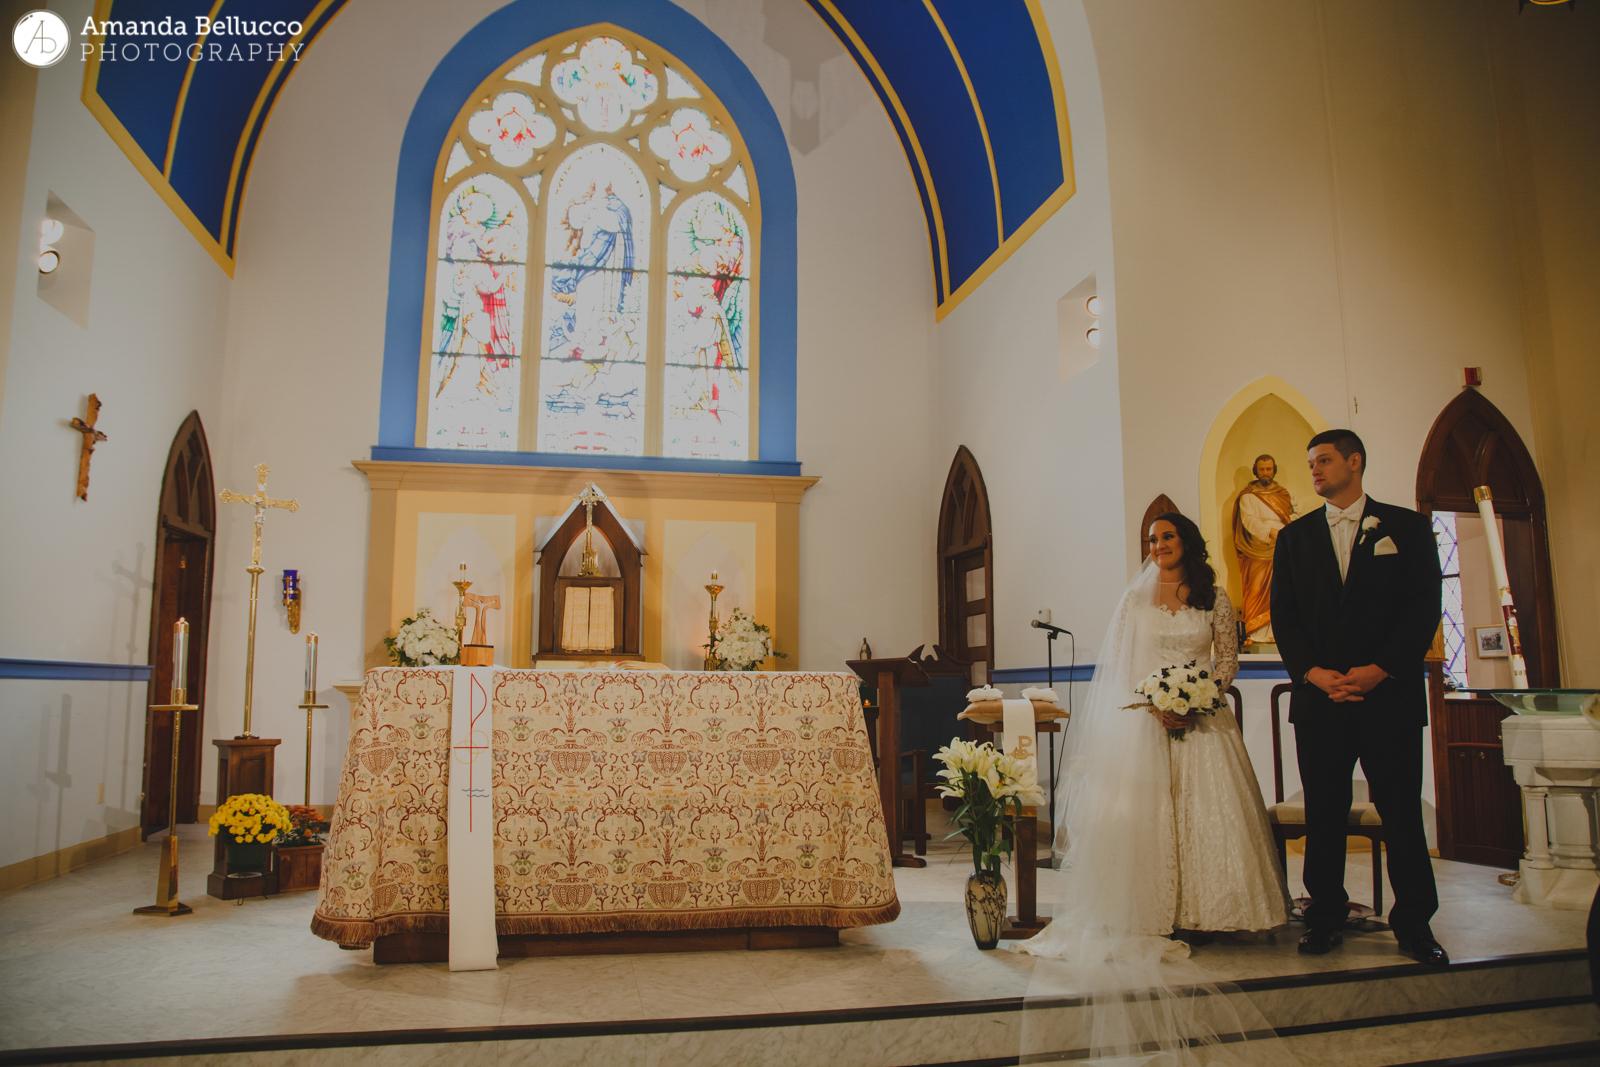 syracuse-rochester-fine-art-wedding-photographer-36.JPG